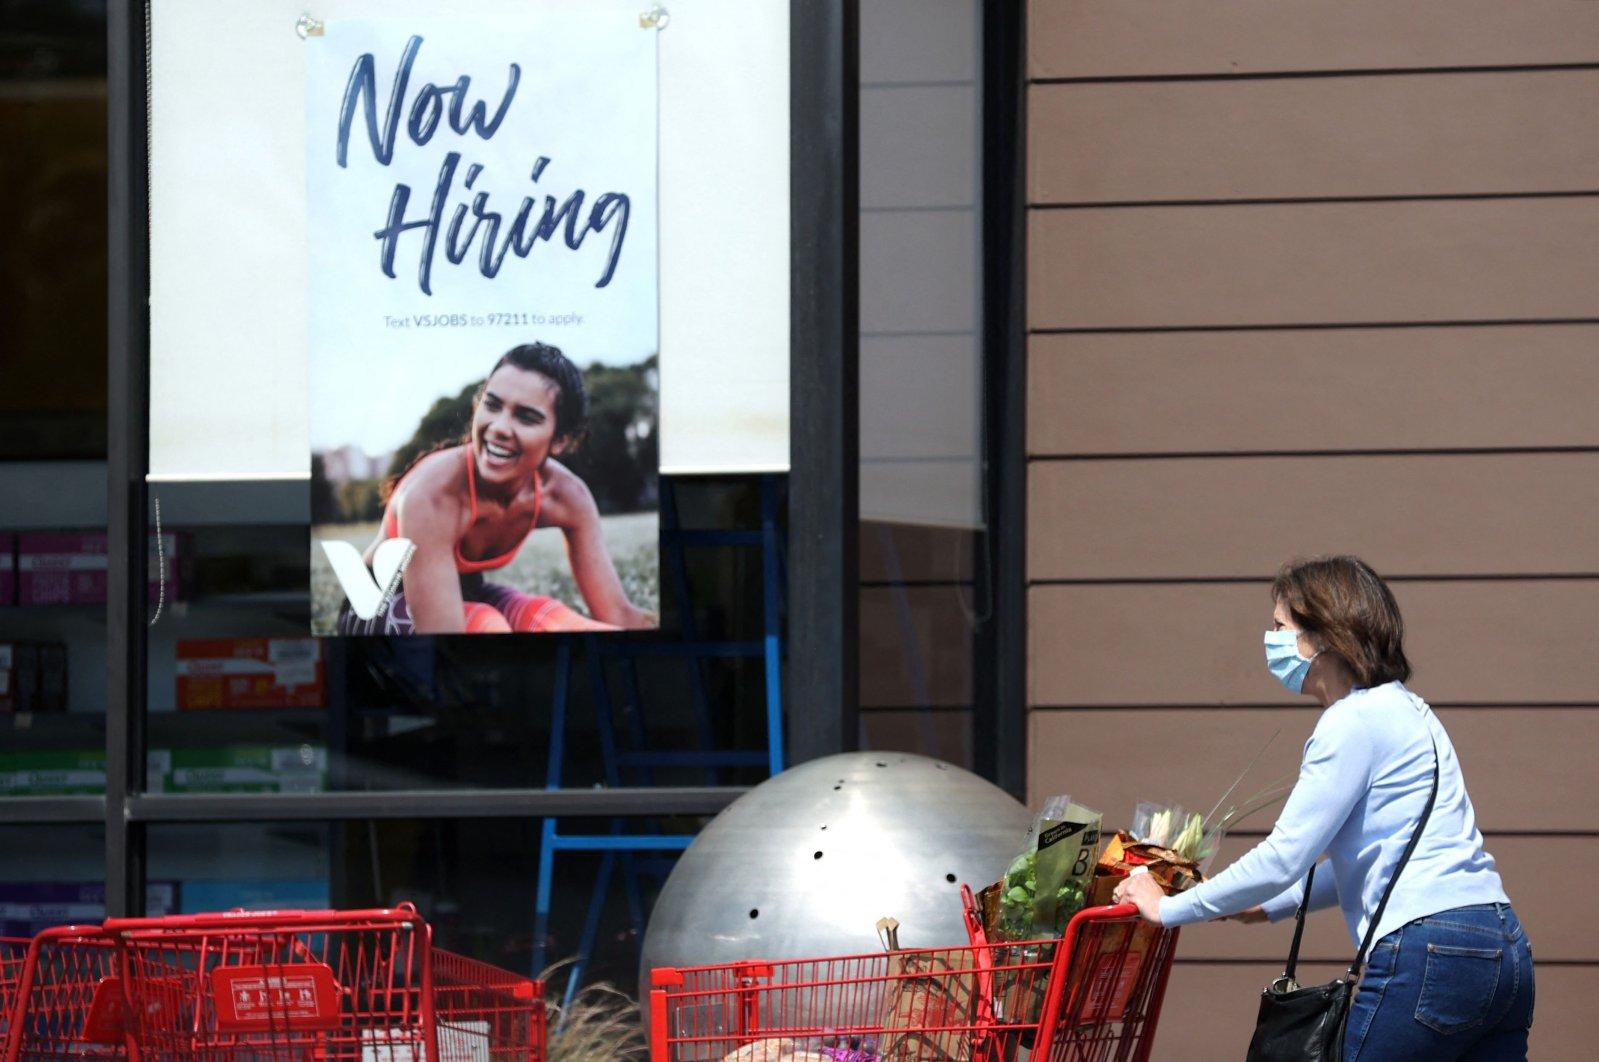 A pedestrian walks by a now hiring sign in Larkspur, California, U.S., April 2, 2021. (AFP Photo)